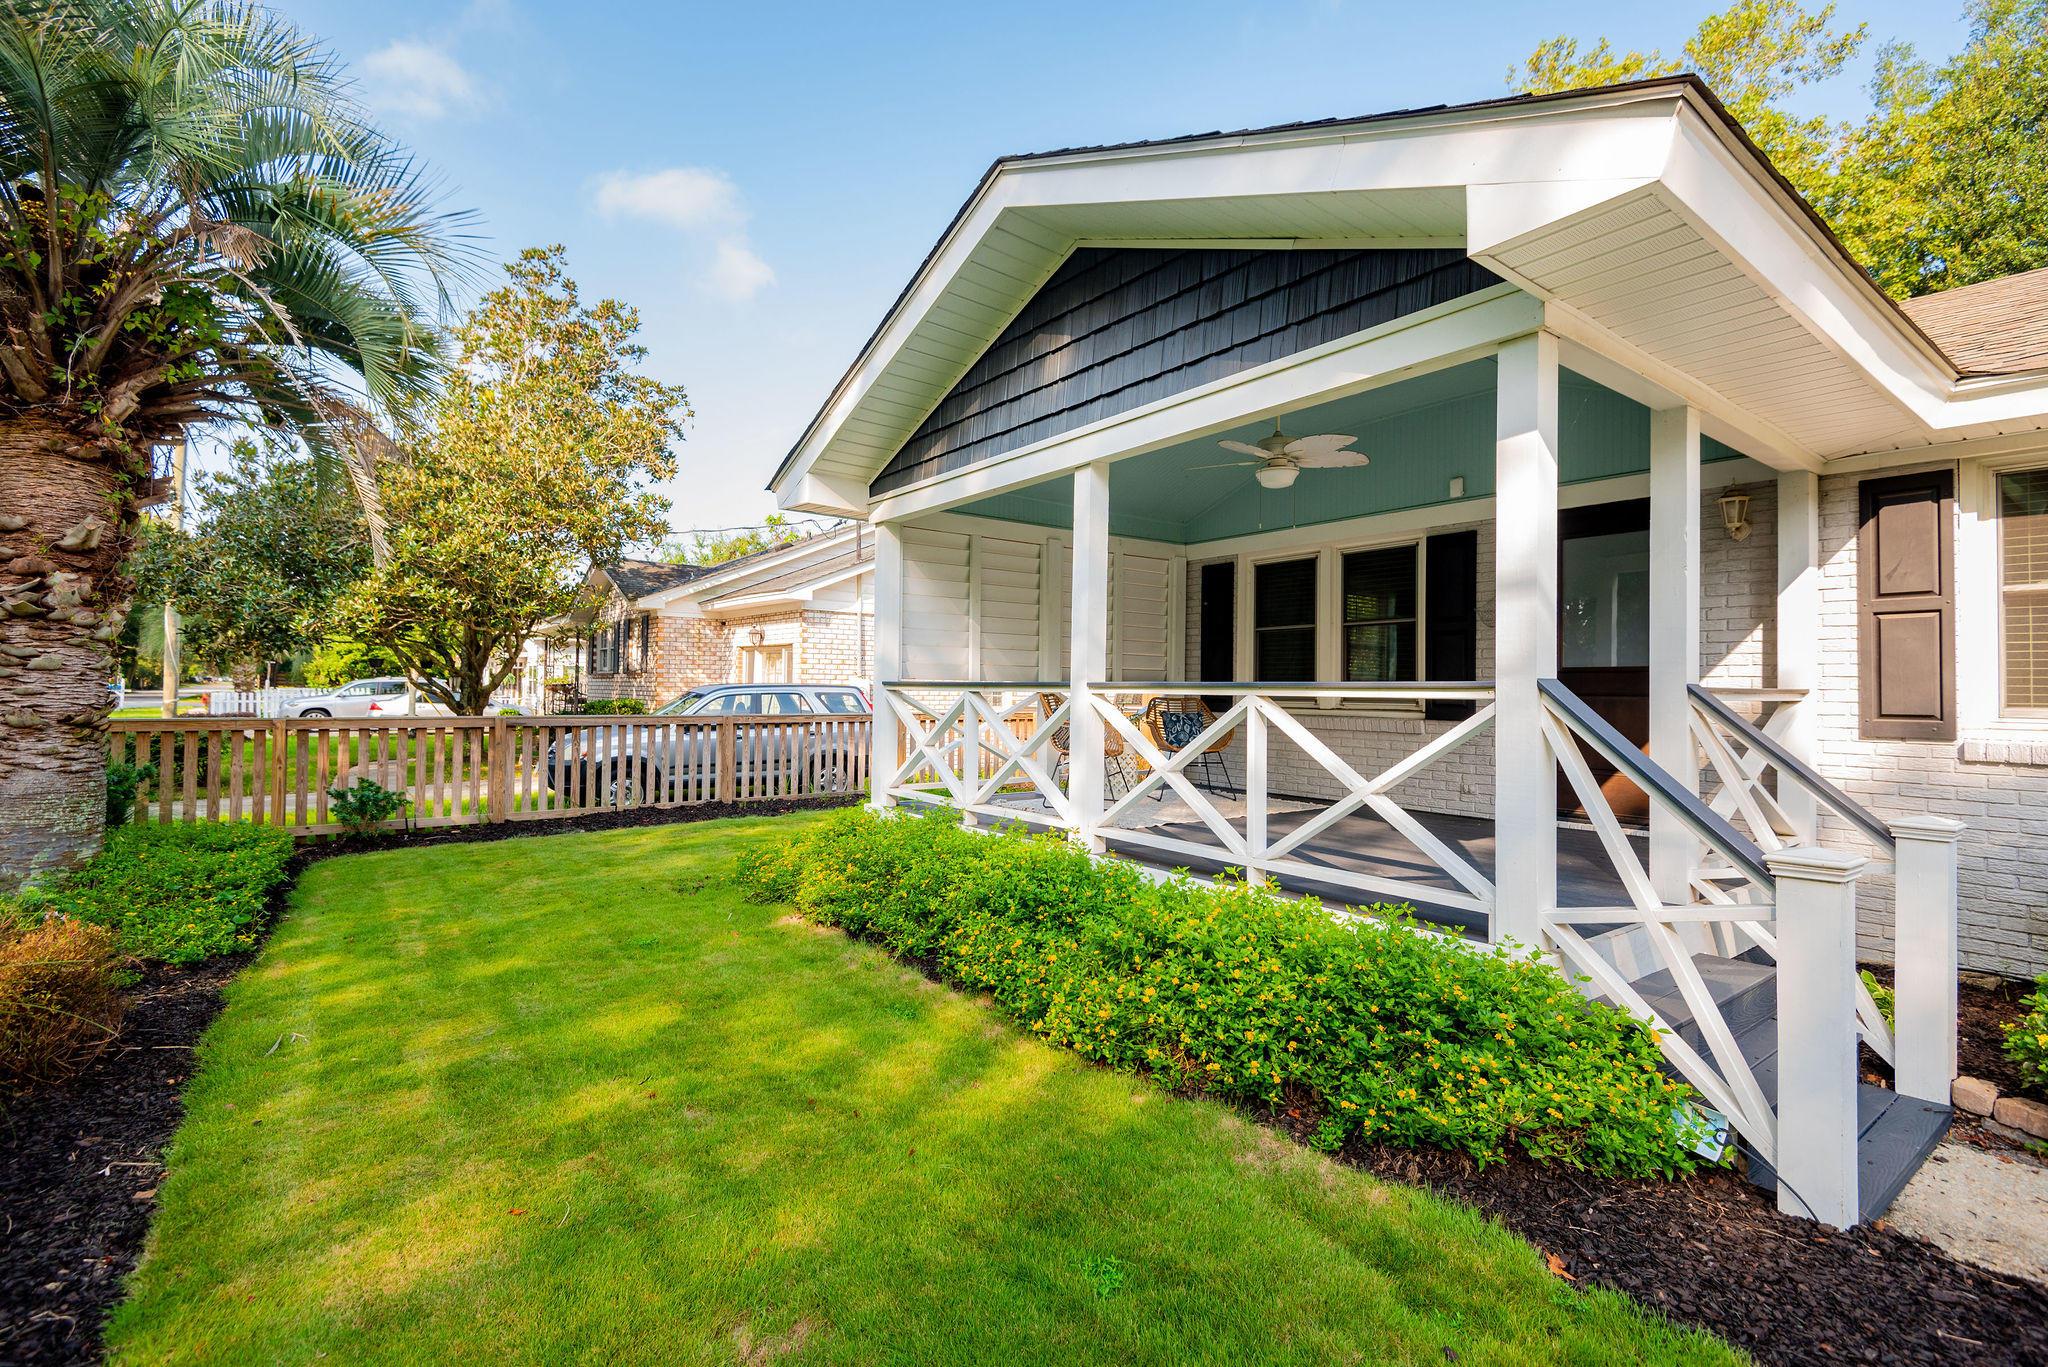 Old Mt Pleasant Homes For Sale - 914 Center, Mount Pleasant, SC - 3